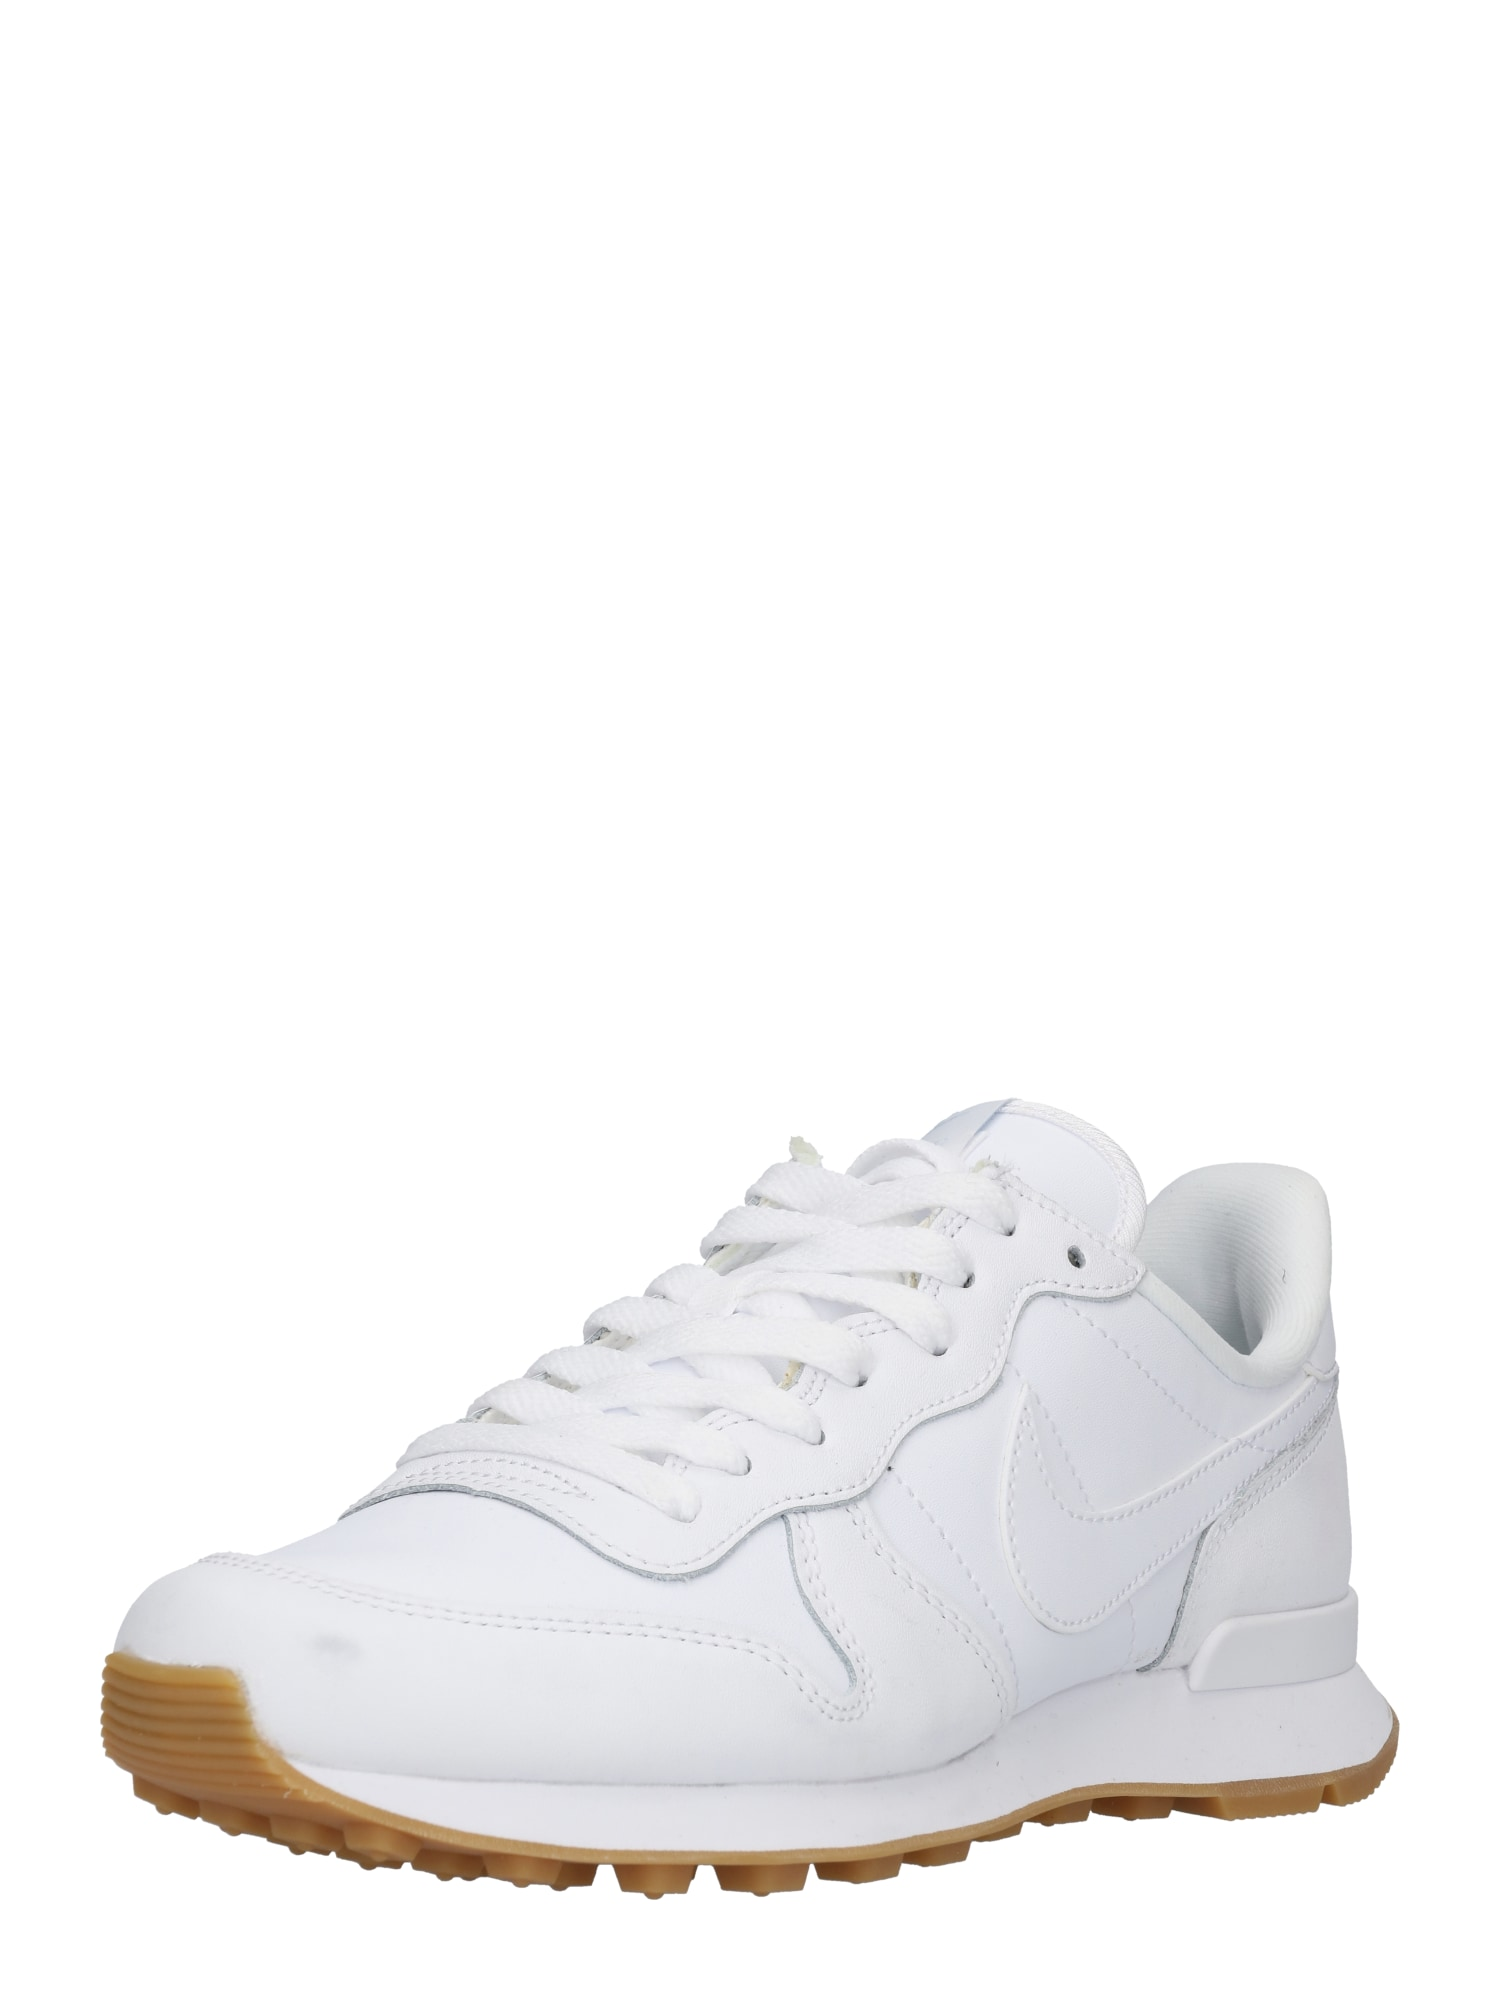 Tenisky Internationalist bílá Nike Sportswear